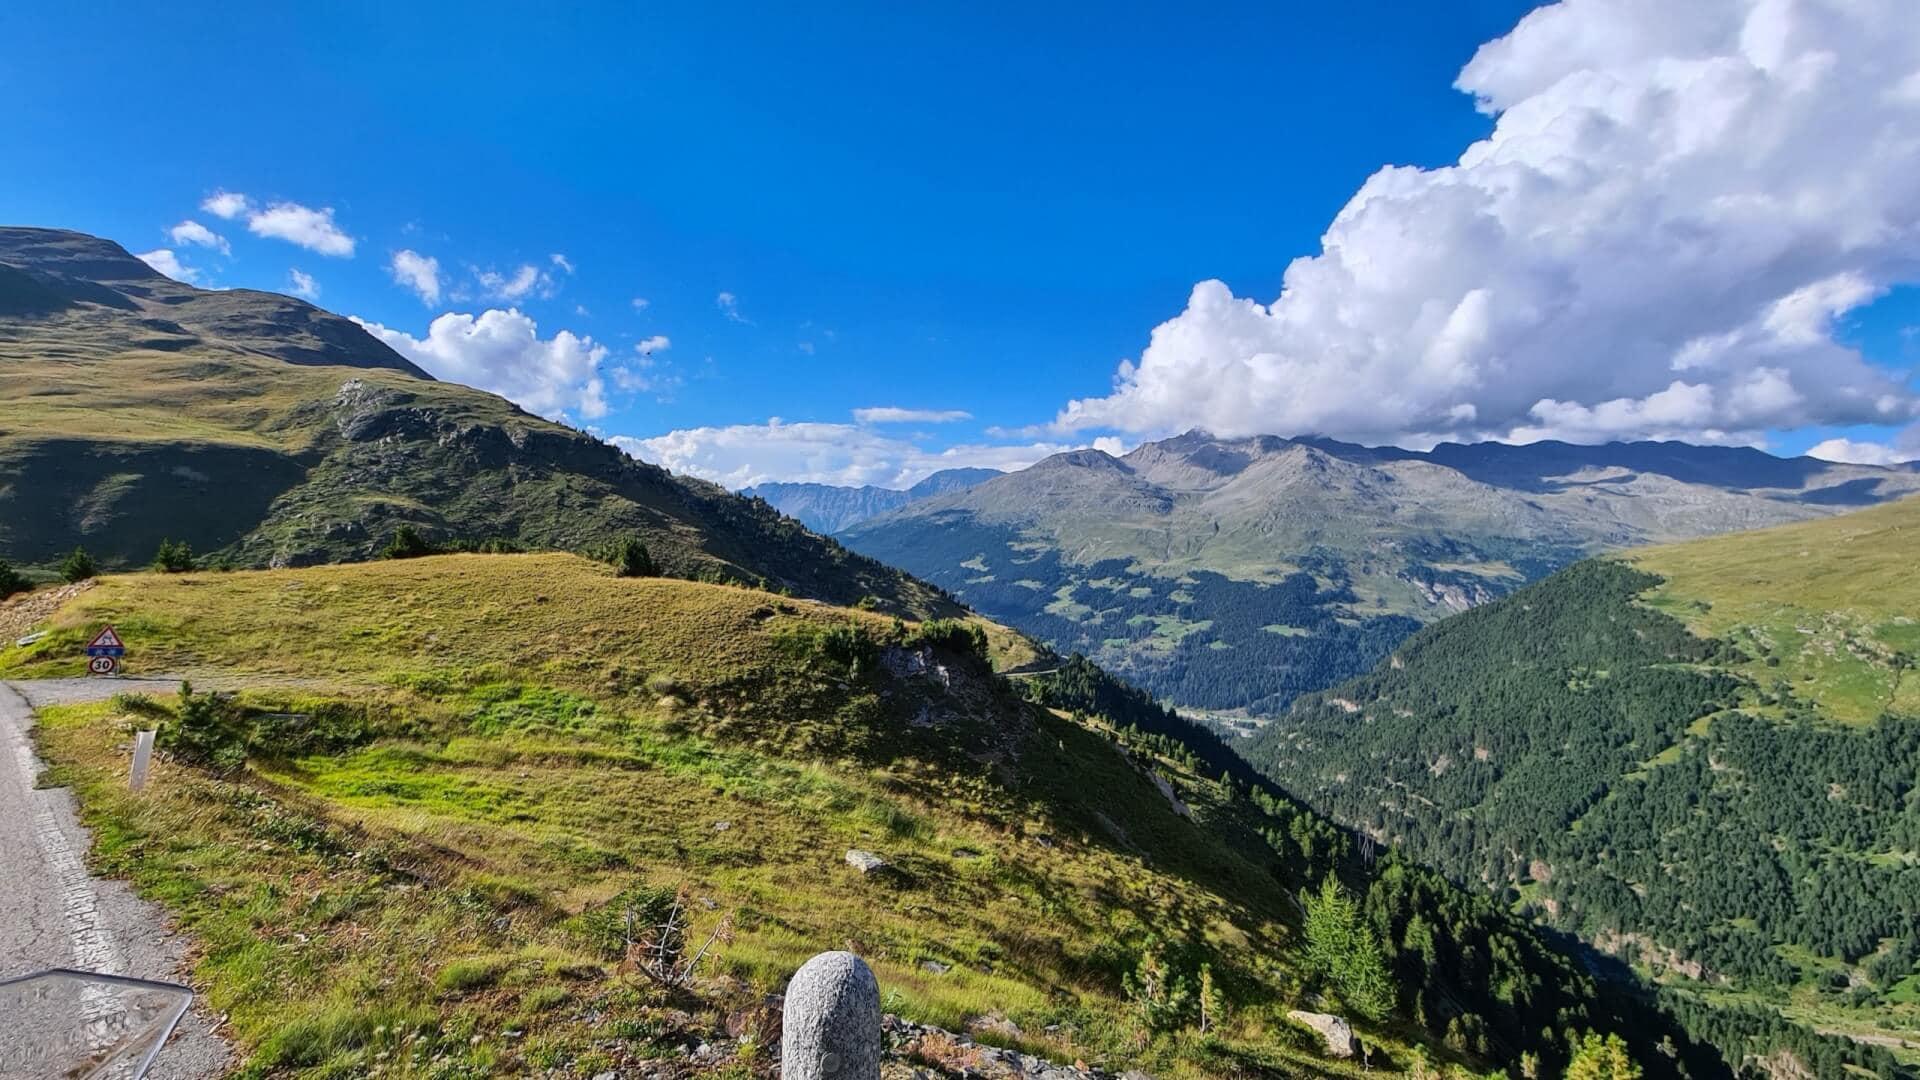 Abfahrt Passo Gavia, 2652 m